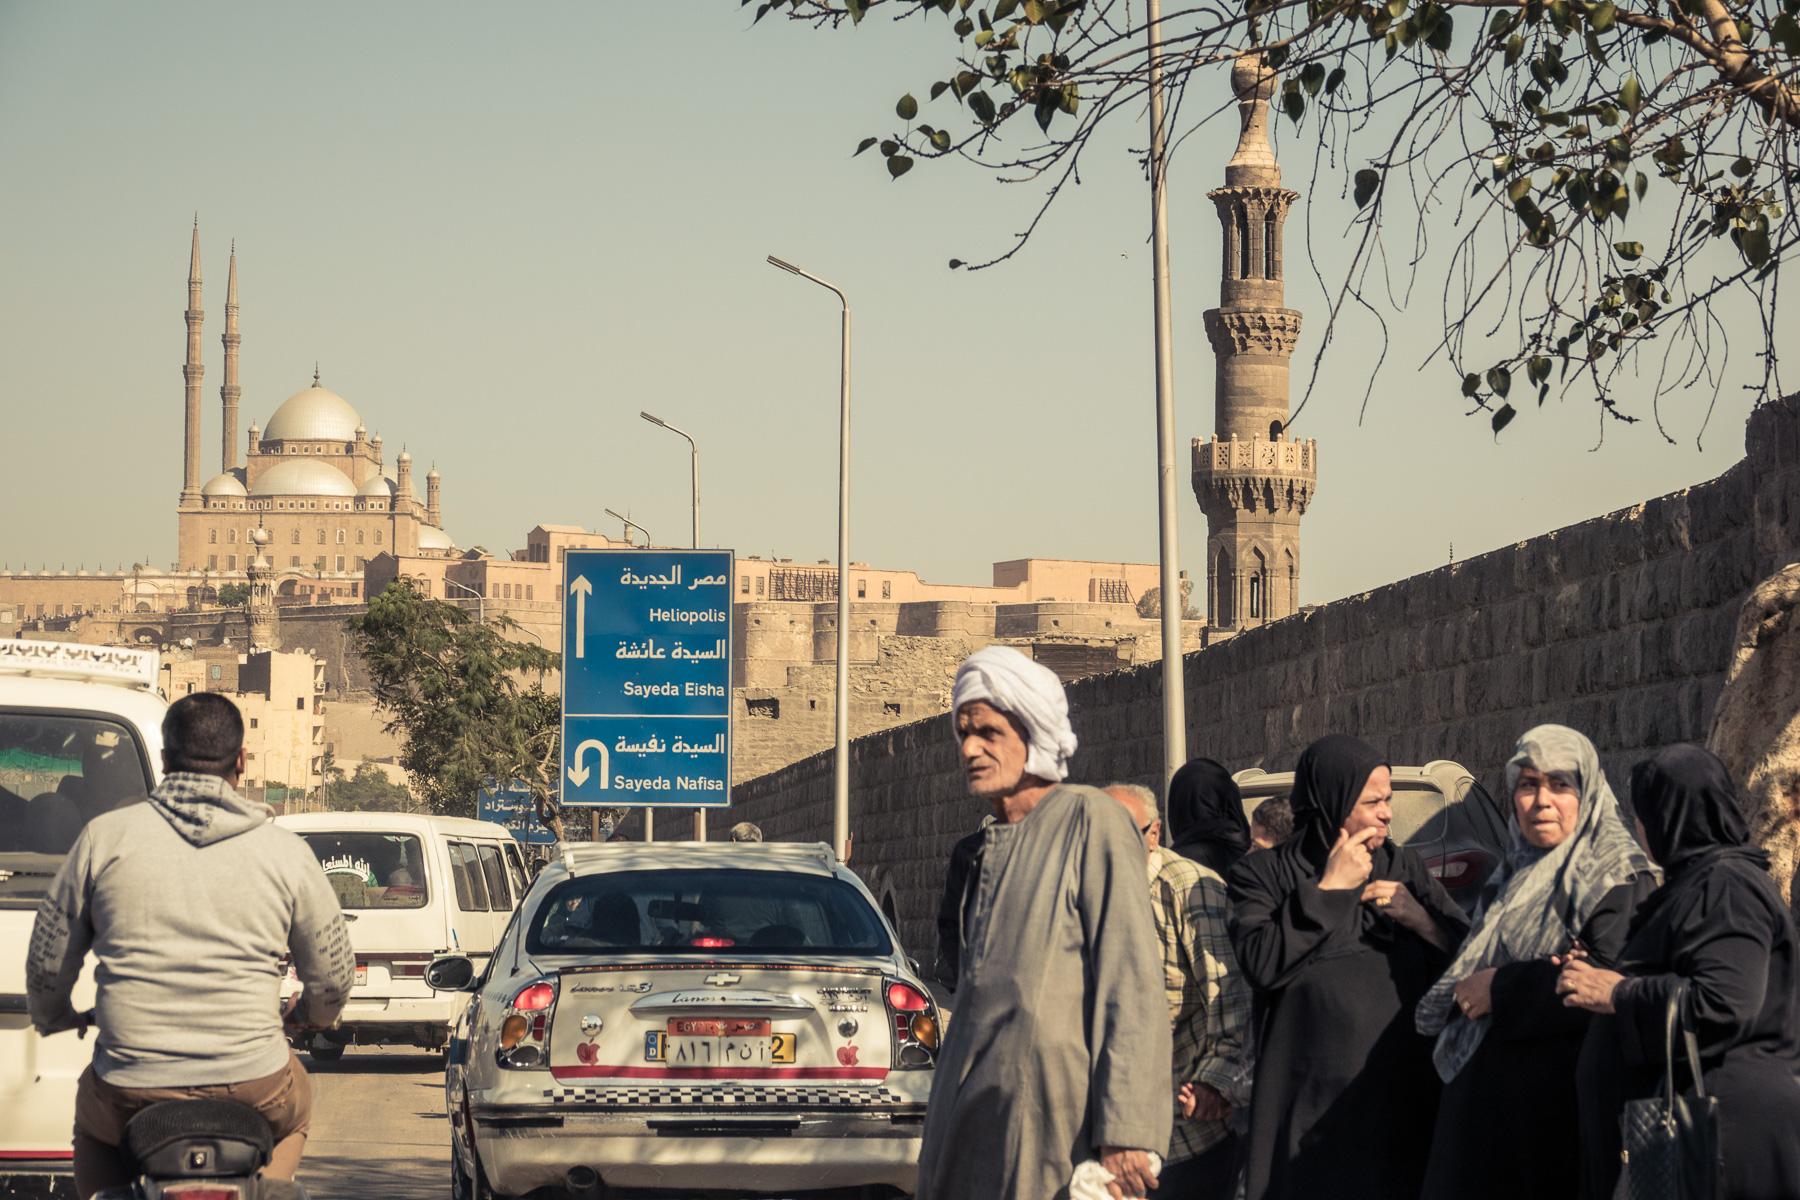 11-cairo-streets-13.jpg